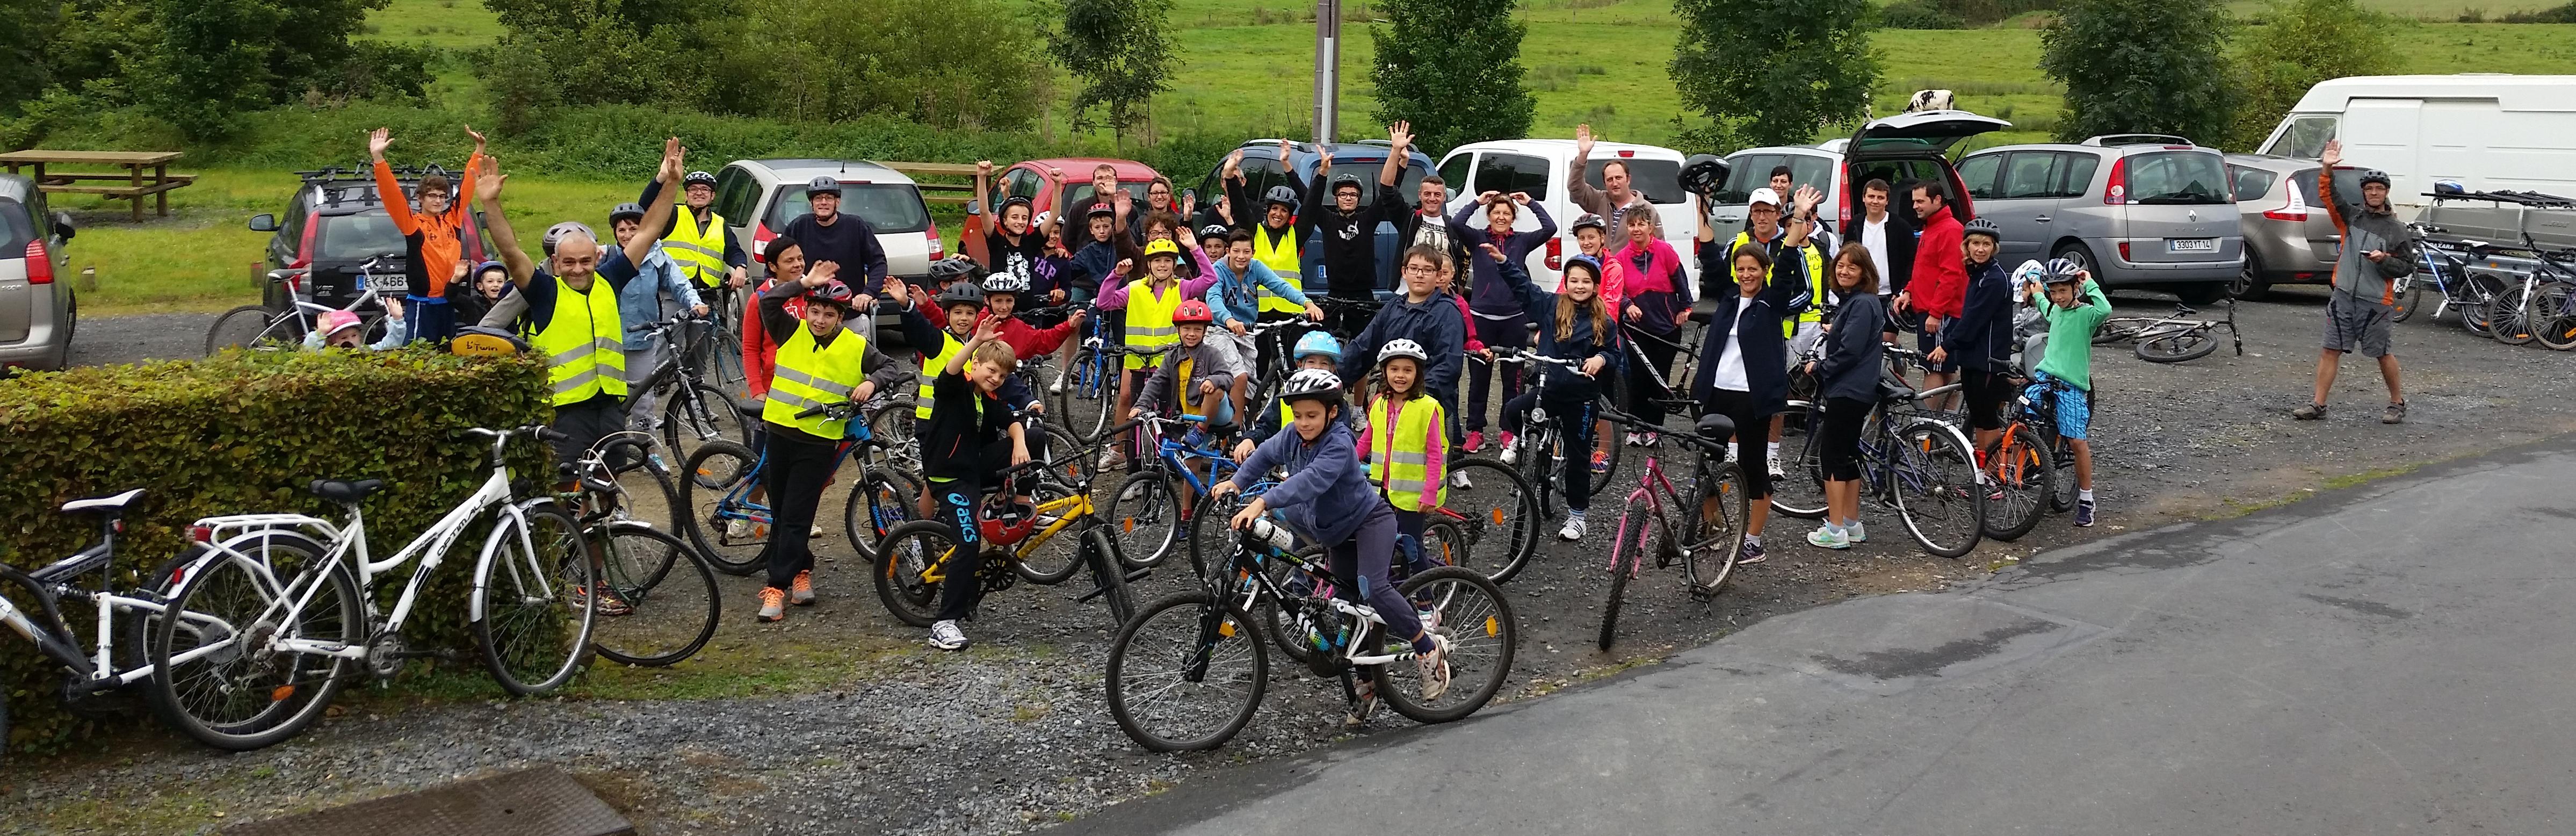 groupecycliste